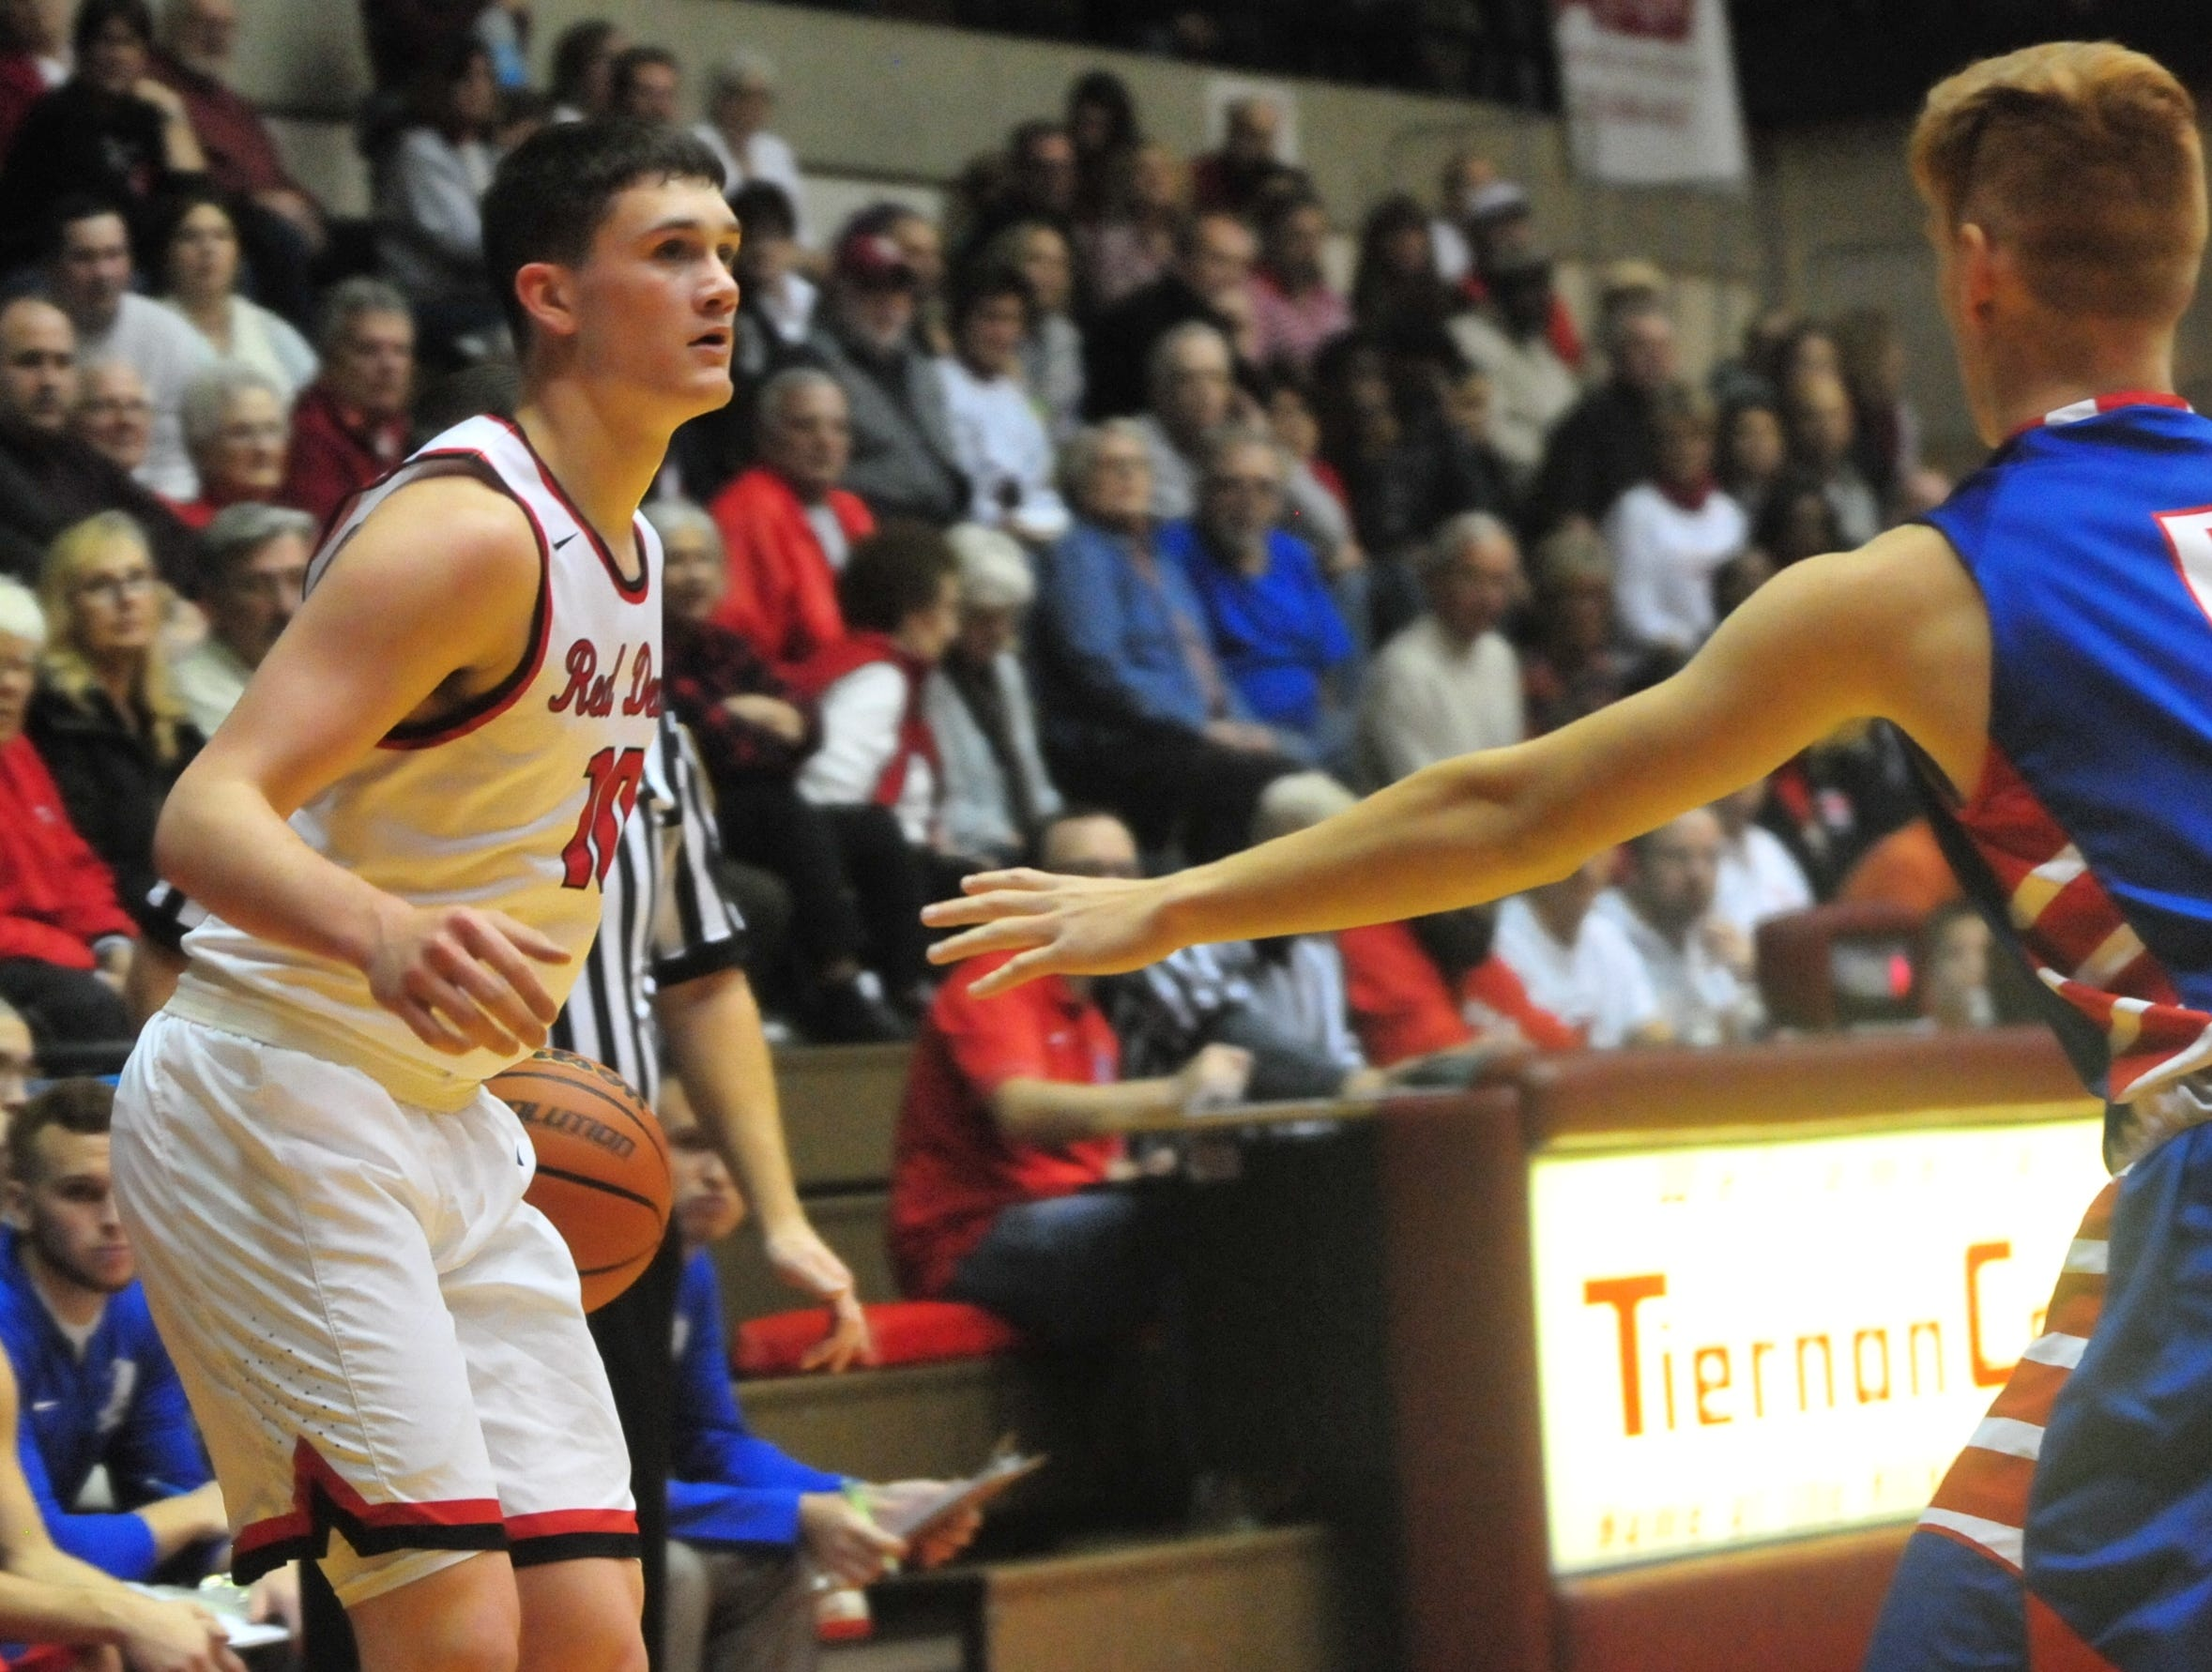 Richmond High School senior Lucas Kroft handles the ball during a boys basketball game against Jay County Saturday, Nov. 24, 2018 at Richmond High School's Tiernan Center.